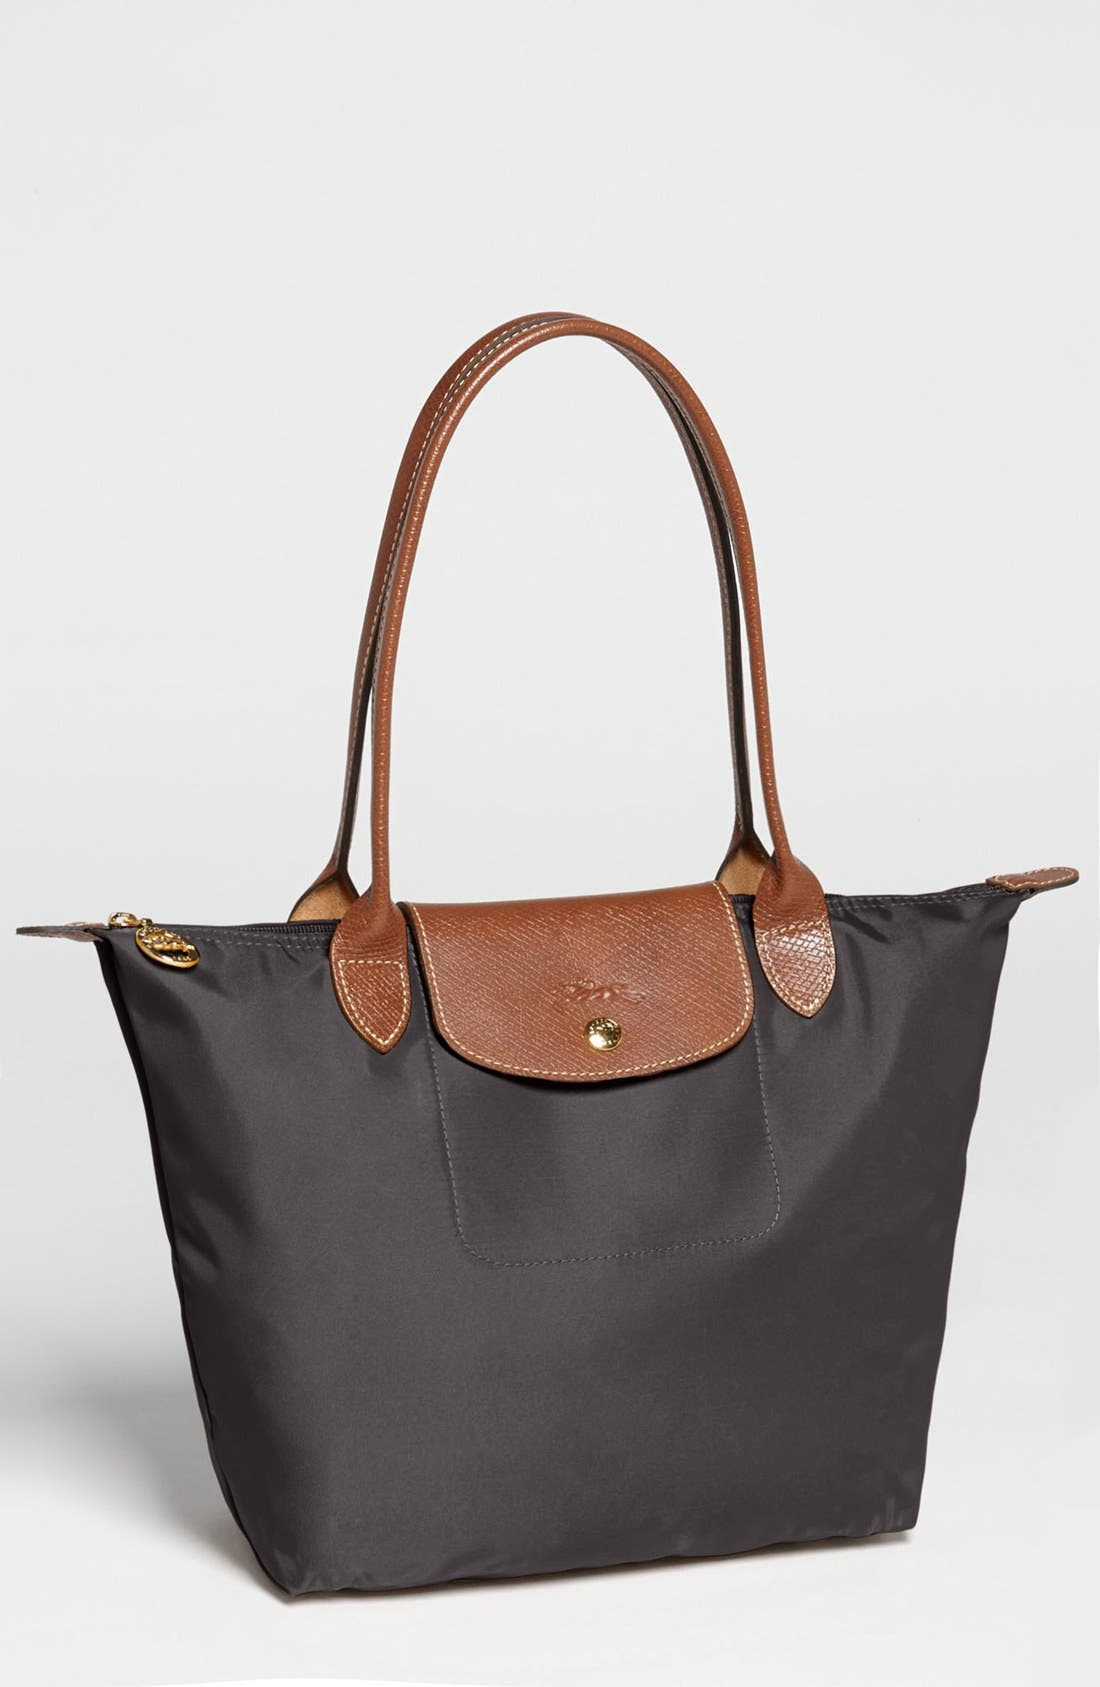 Longchamp 'Small Le Pliage' Shoulder Tote